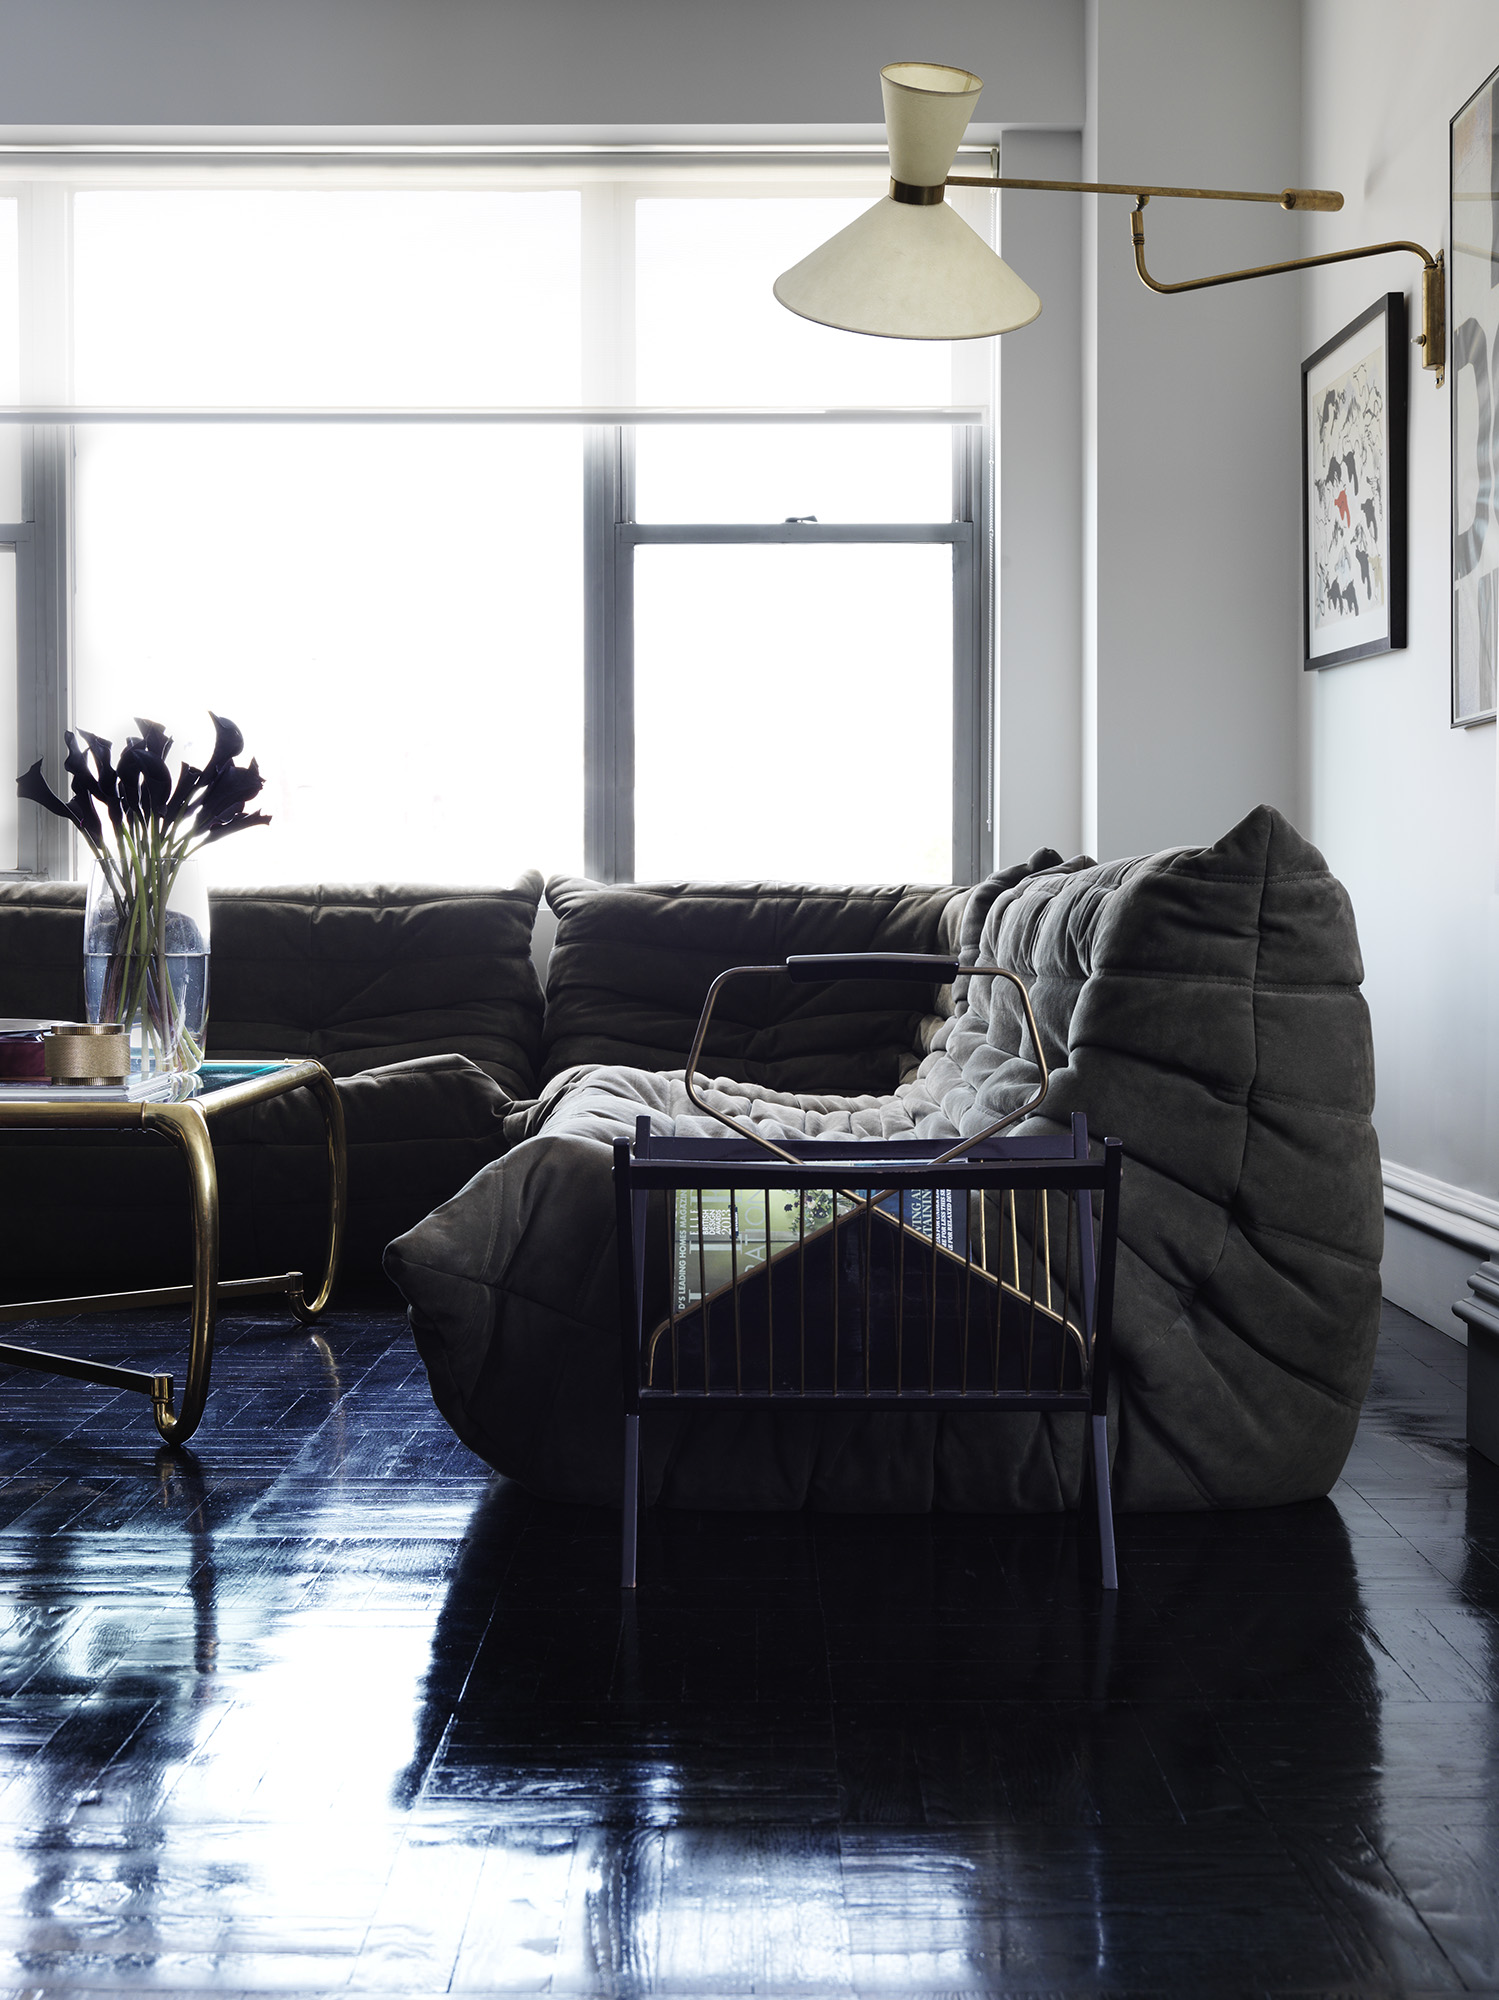 Robyns_Apartment_073.jpg